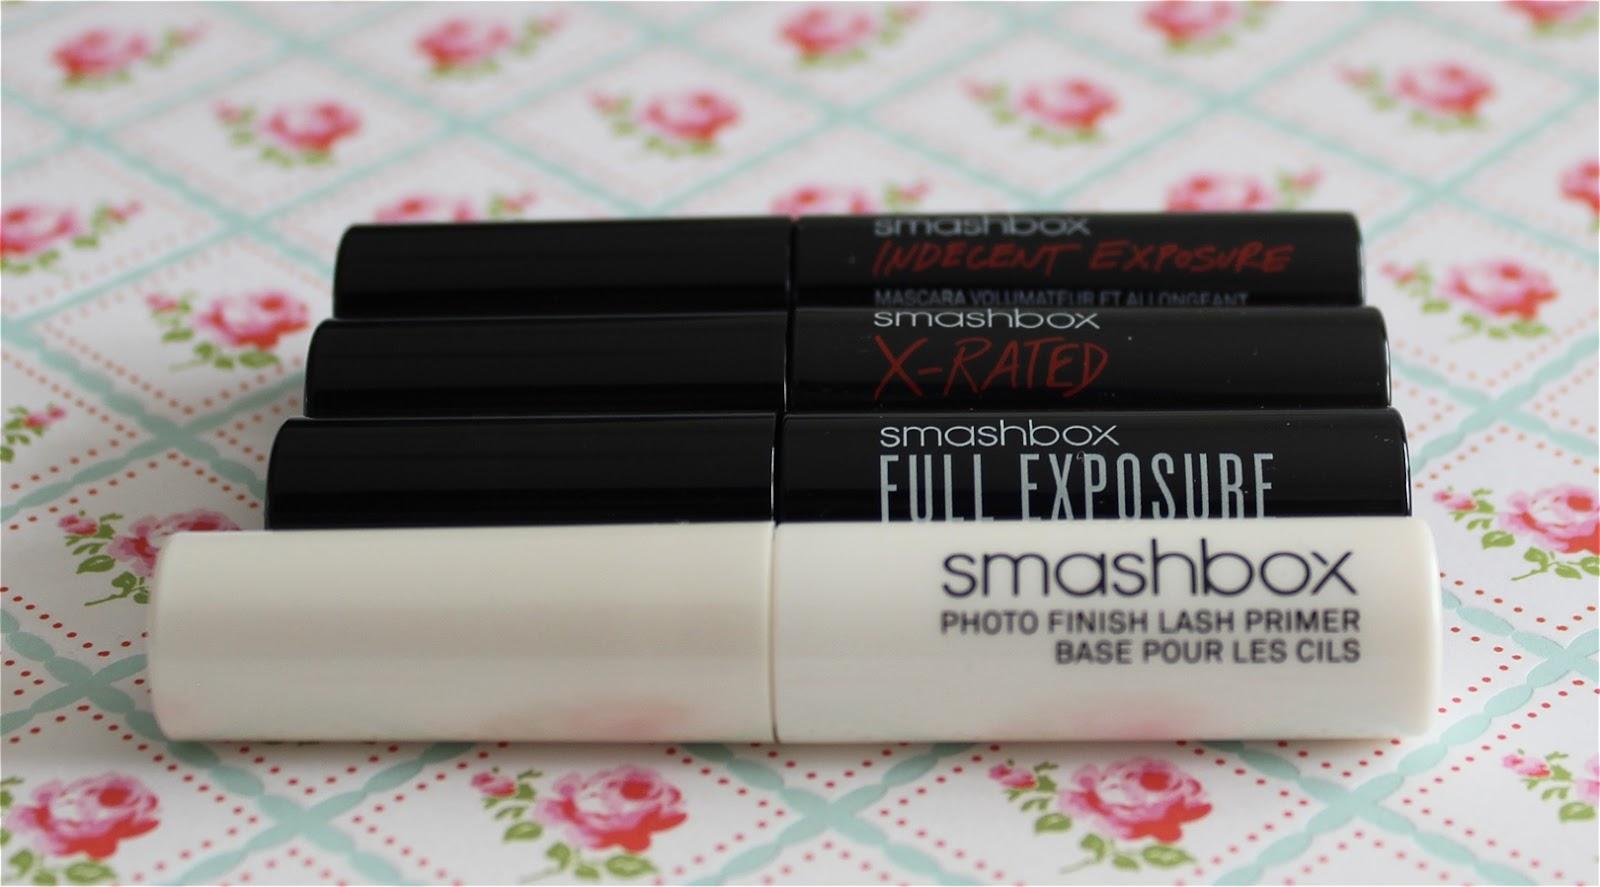 Smashbox Try It Kit Lash Primer + Mascara swatch